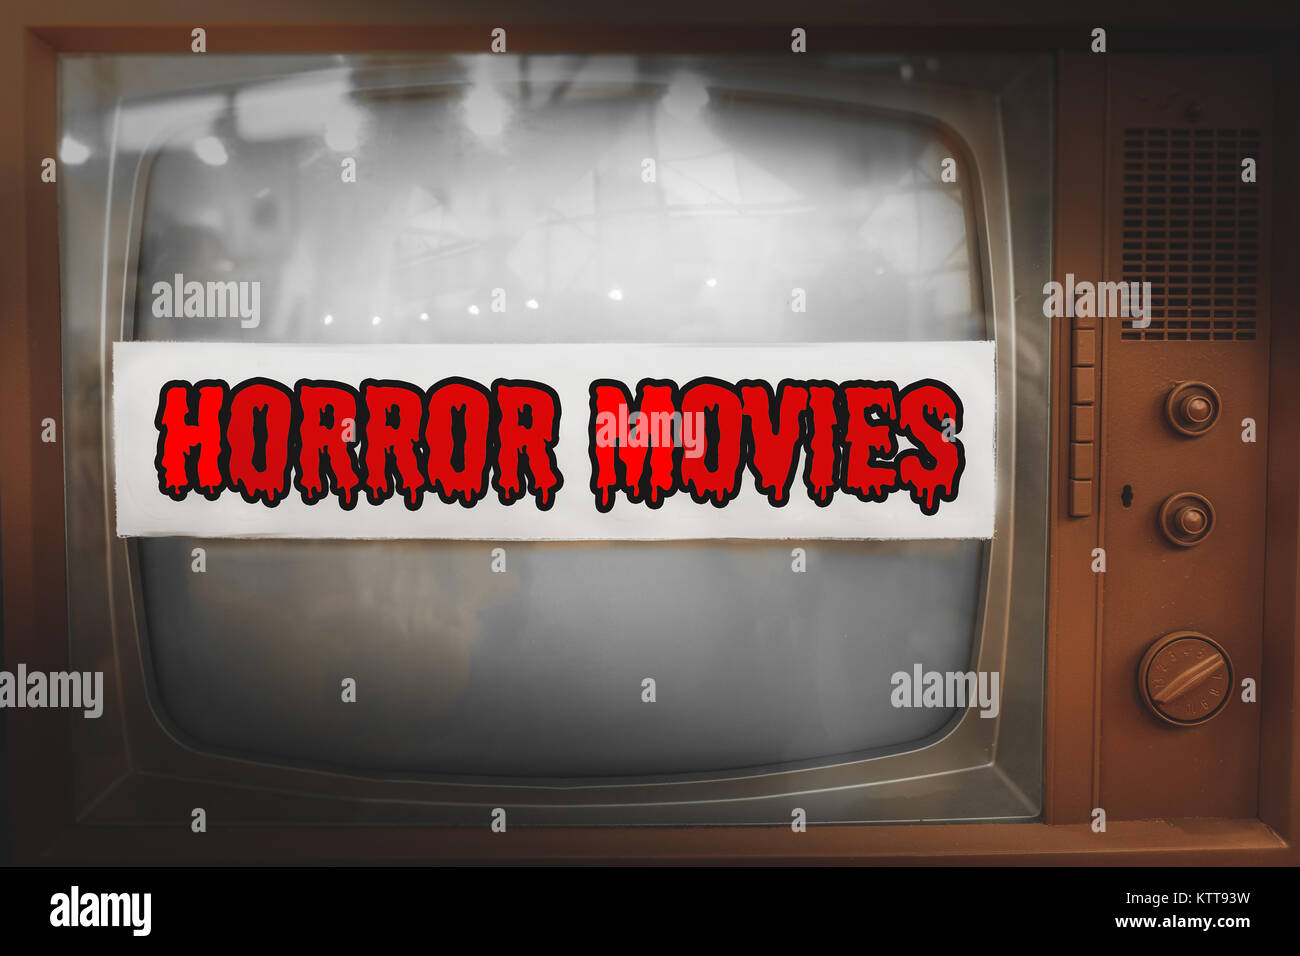 horror movies genre television label old tv text vintage retro - Stock Image